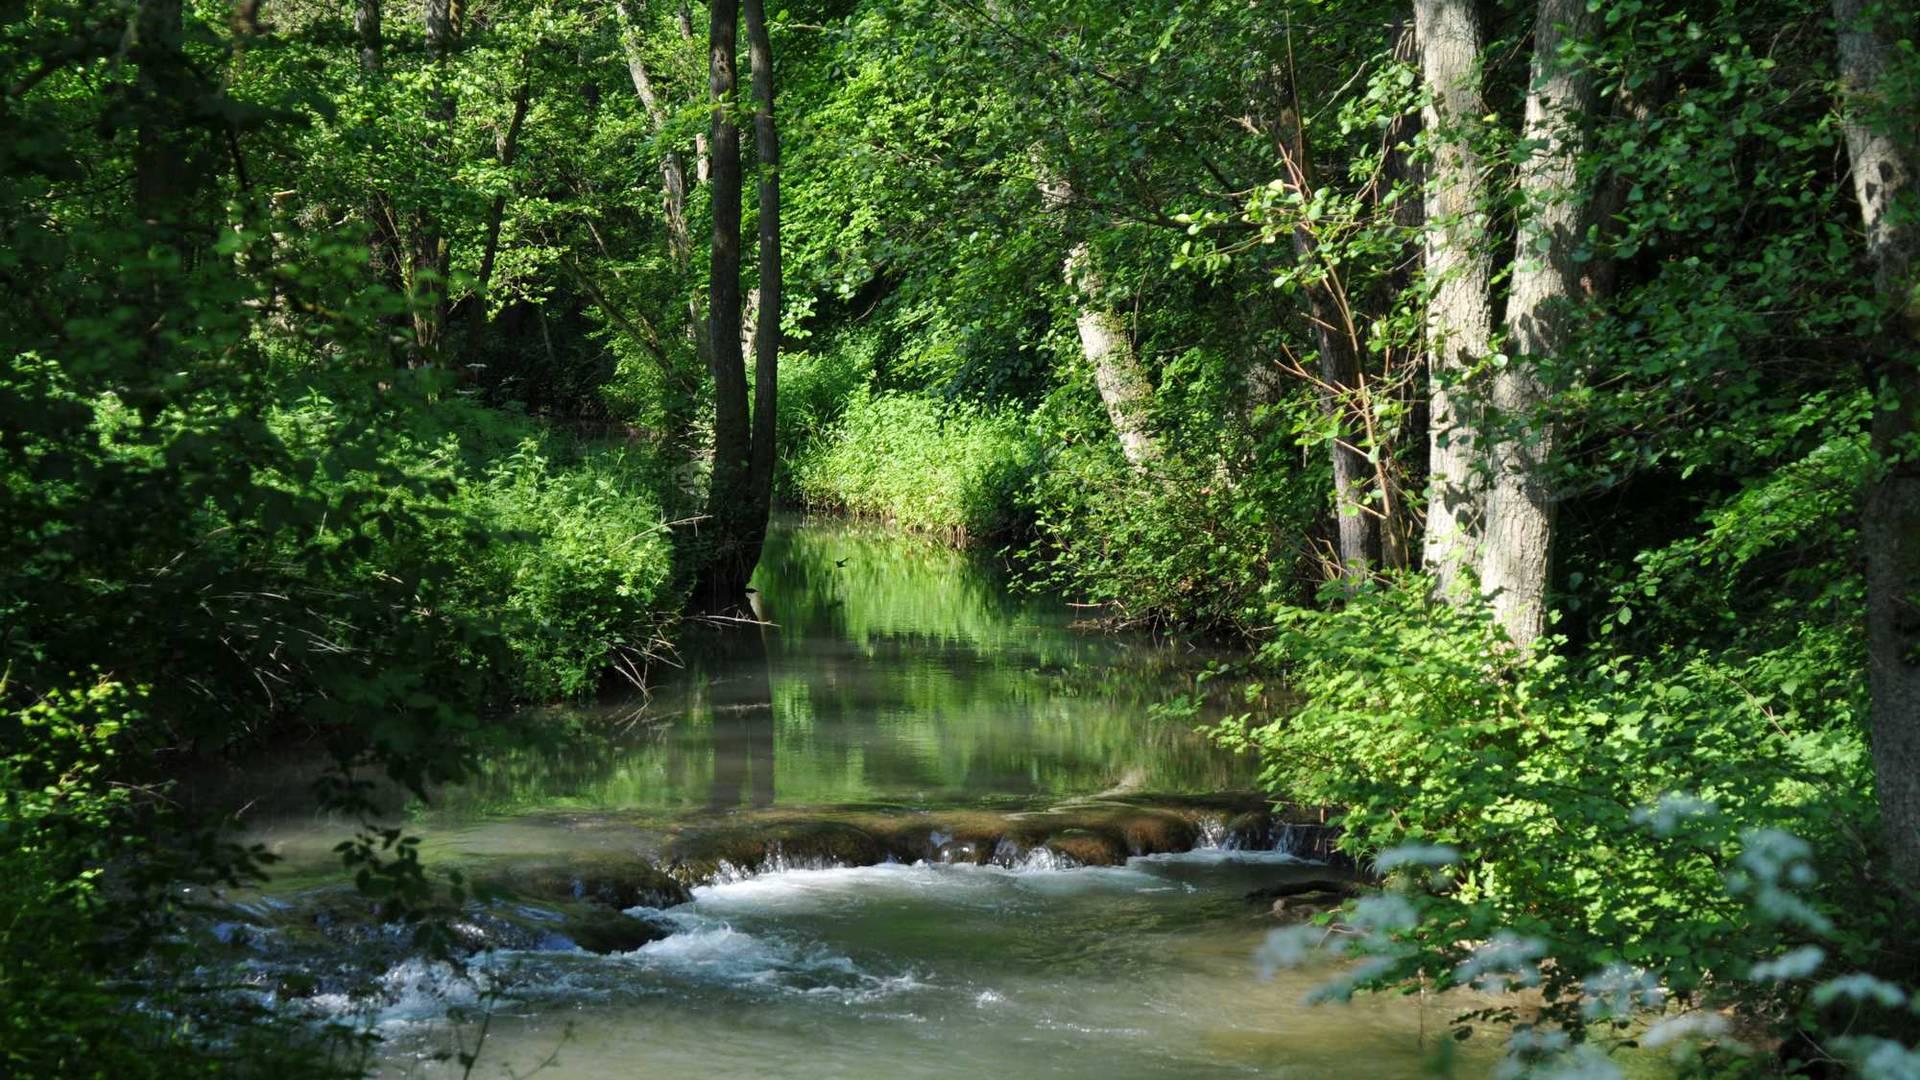 Le Hoyoux au Val Thibiemont - Copyright Philippe Mariage